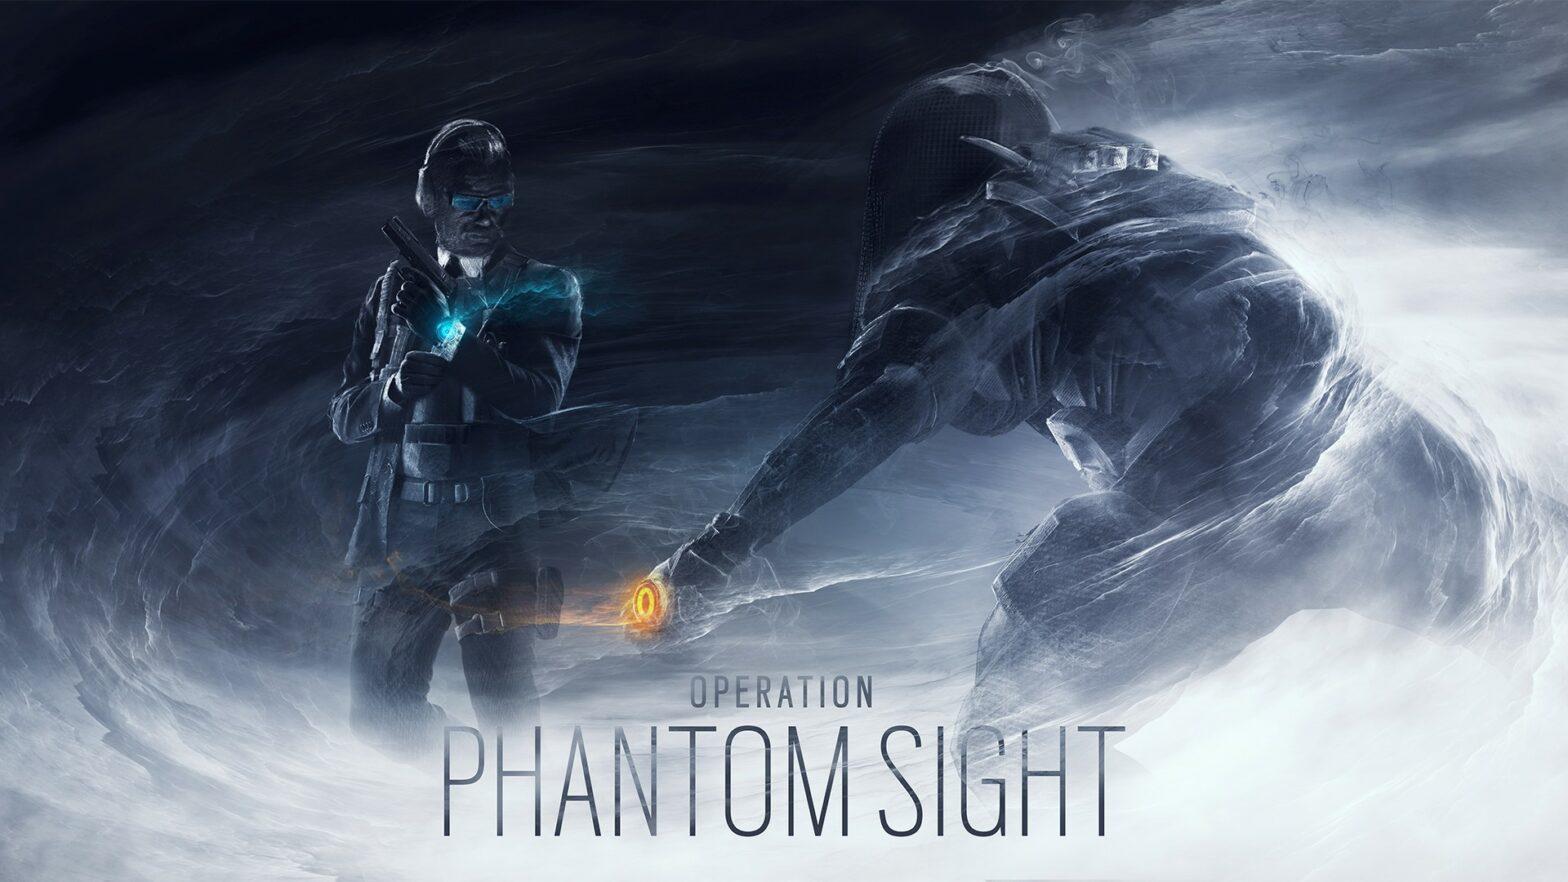 Operation Phantom Sight für Tom Clancy's Rainbow Six Siege enthüllt